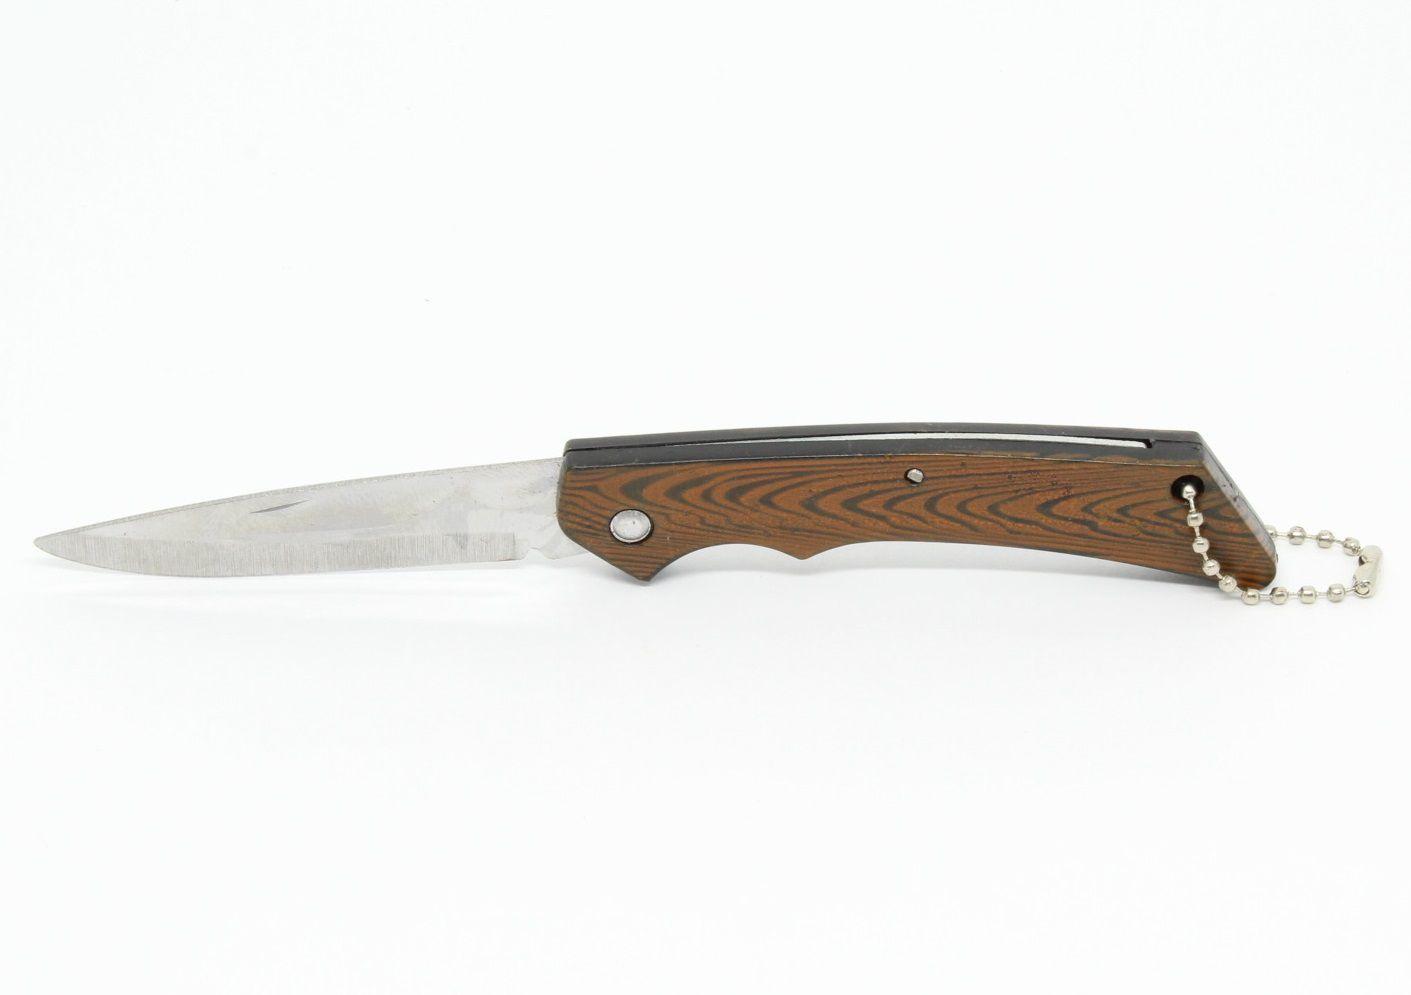 Canivete Xingu XV2846 - Cabo Amadeirado